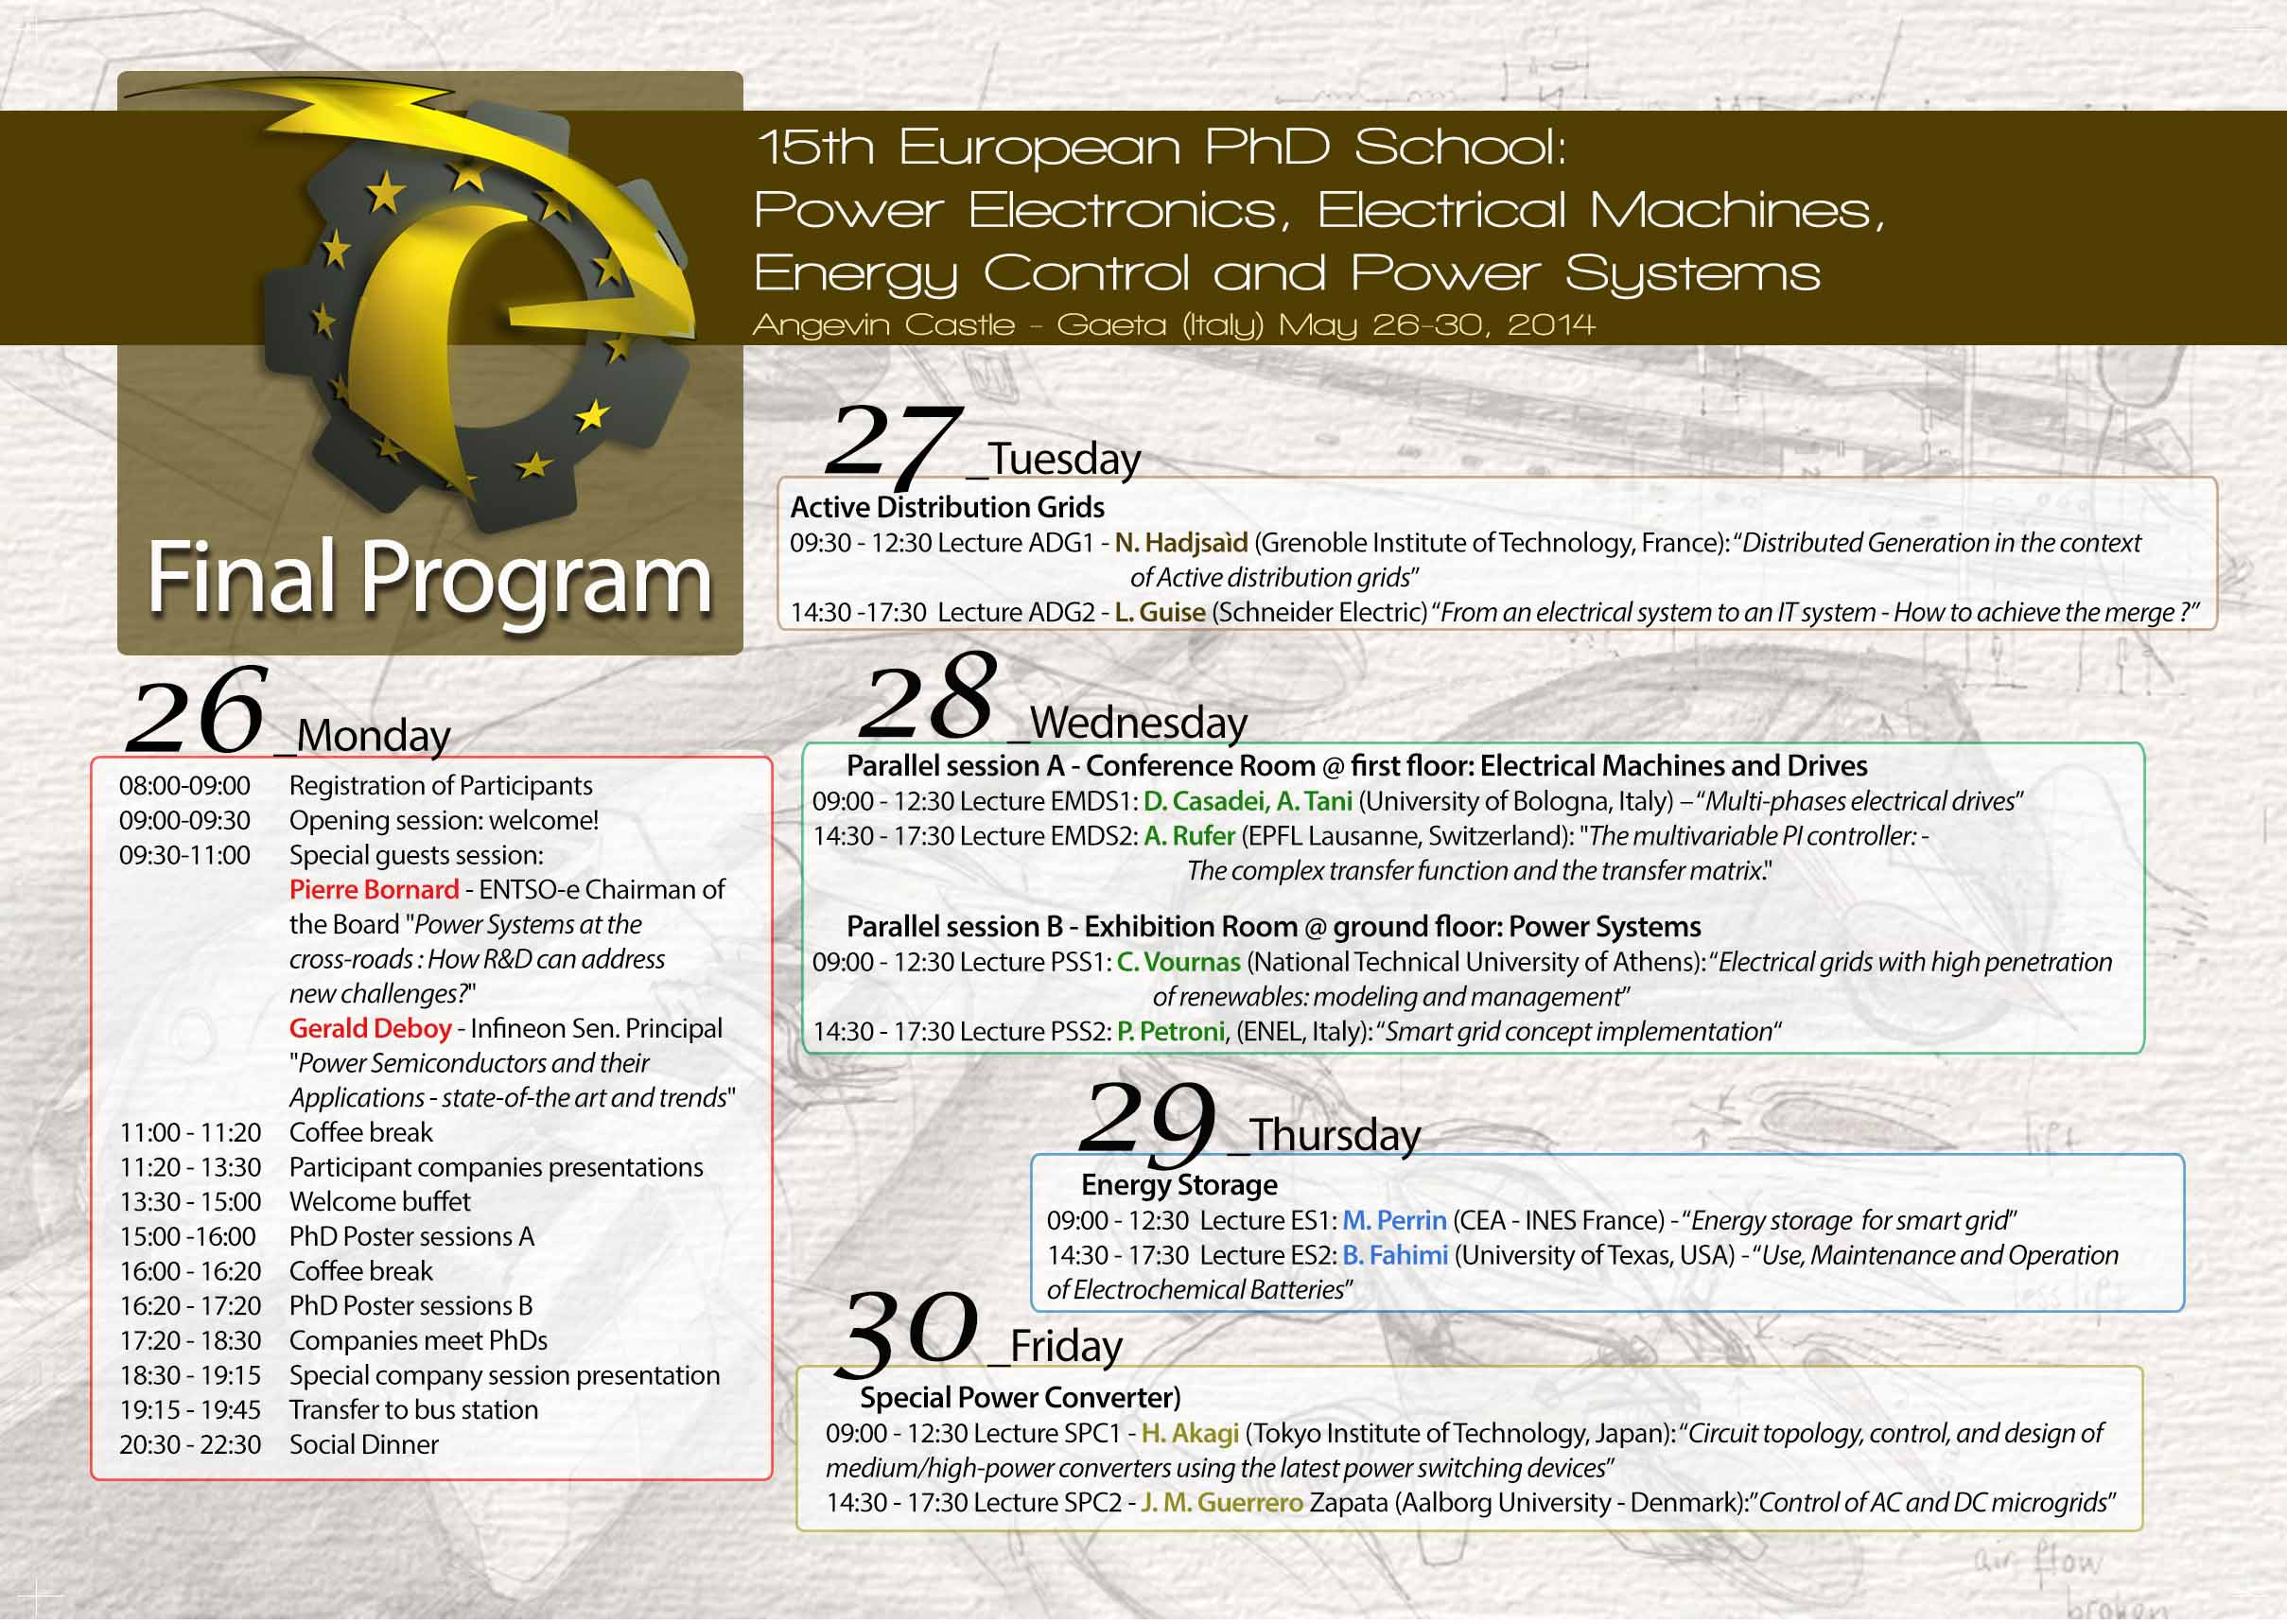 Exelent Schneider Electric Symbols Model - Wiring Standart ...